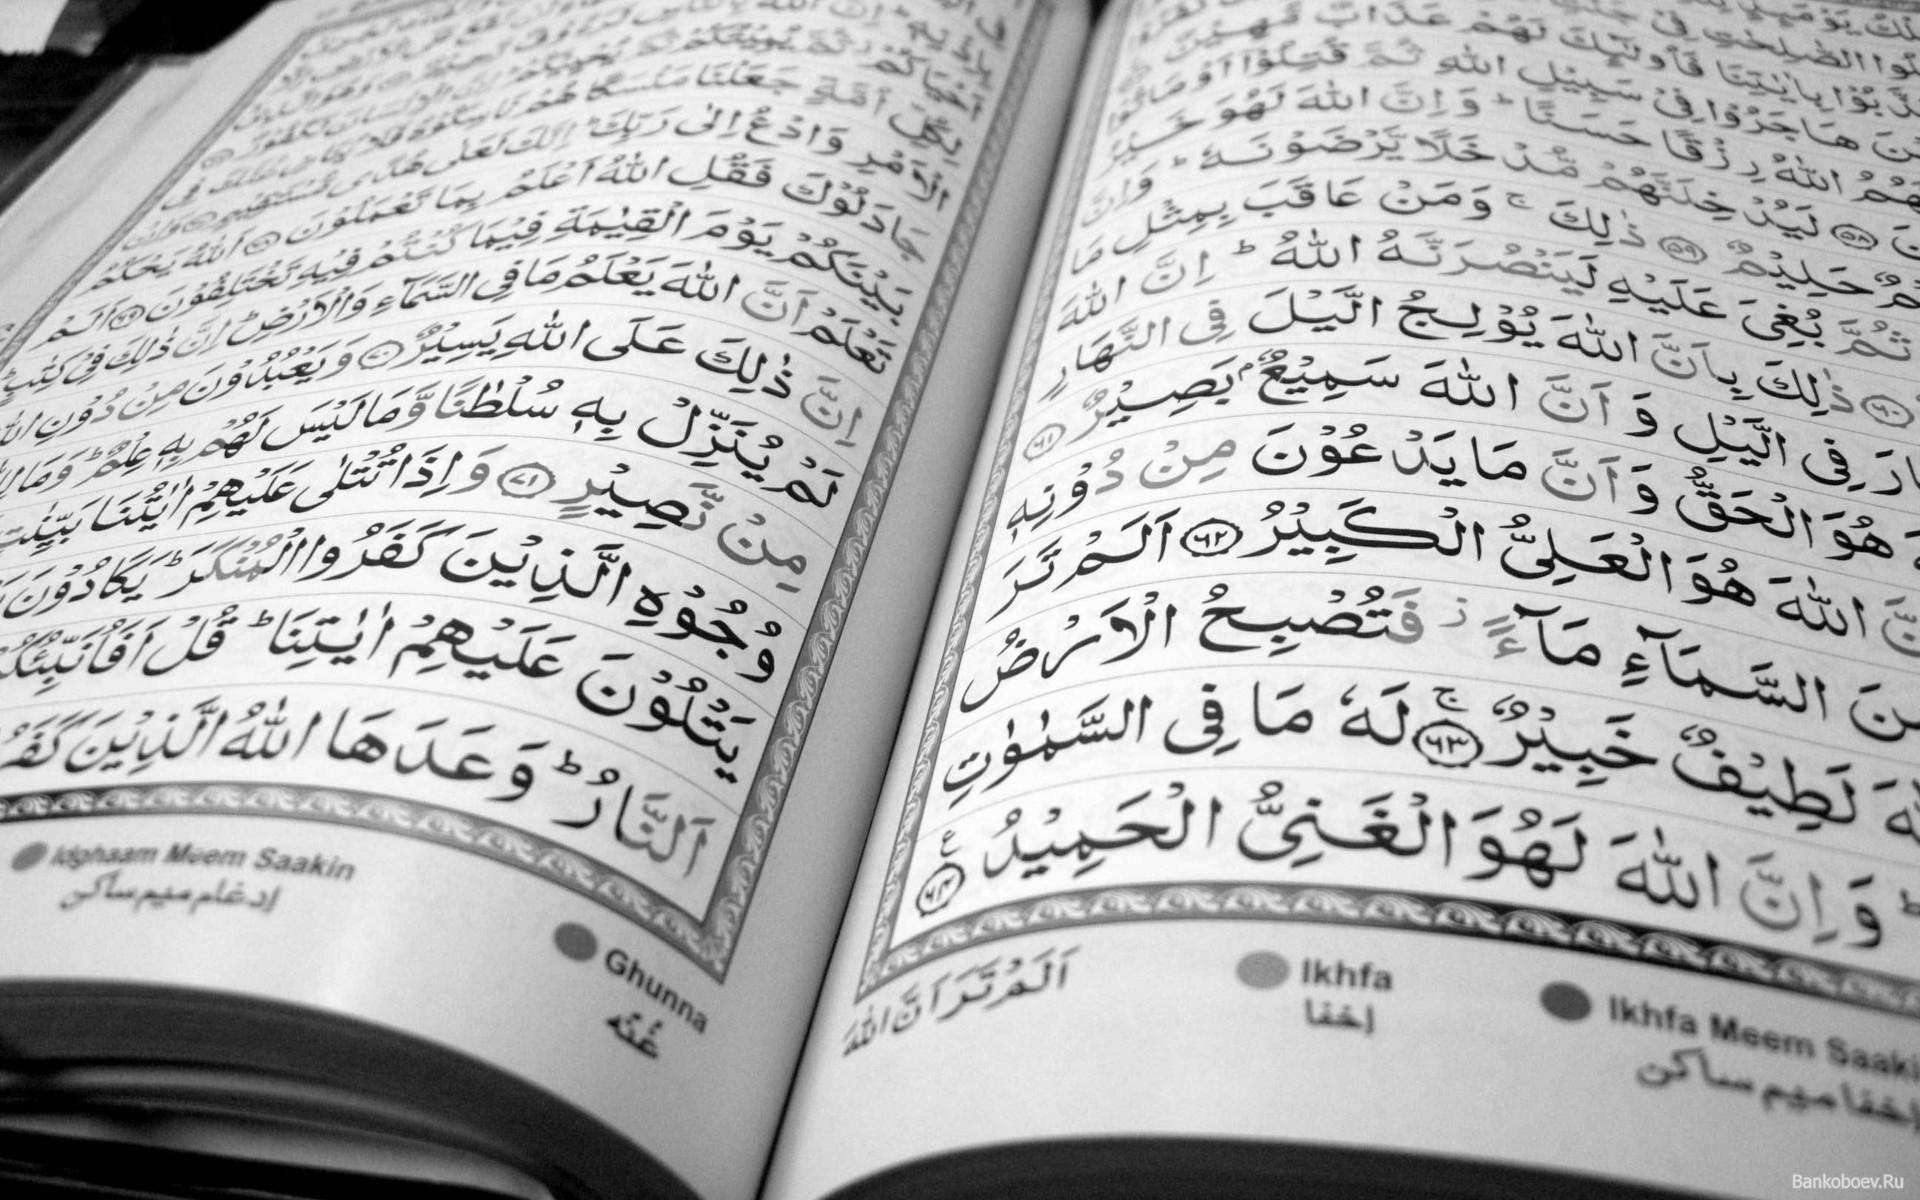 Photo of Обнаружен старейший экземпляр Корана Обнаружен старейший экземпляр Корана Обнаружен старейший экземпляр Корана Bankoboev